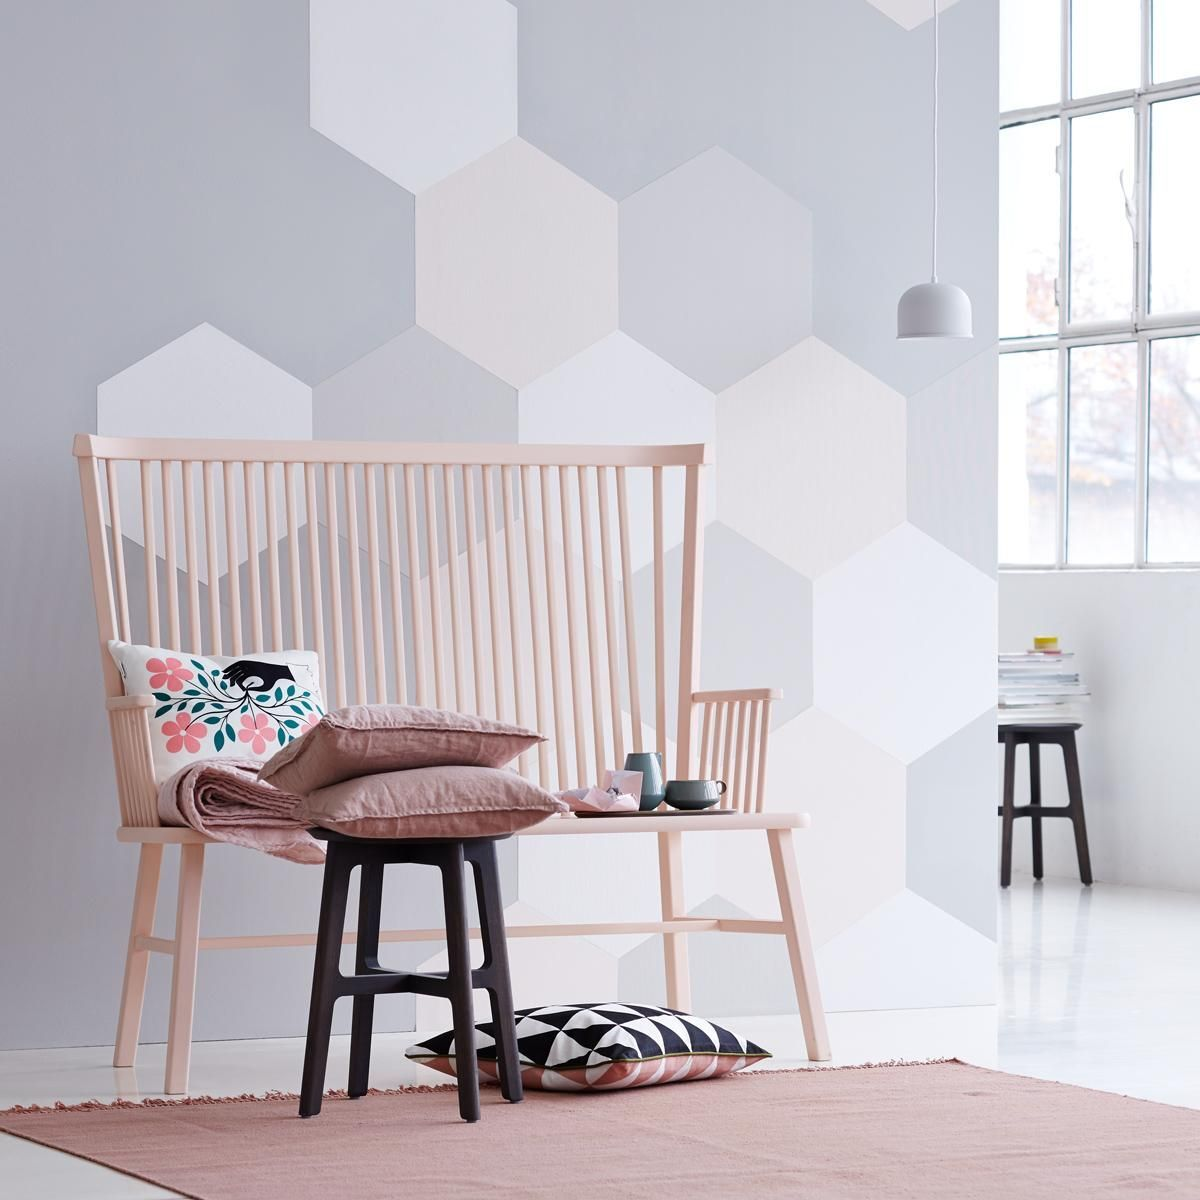 Kreative Ideen Für Individuelle Wandgestaltung Home Decor House Interior Room Wall Colors